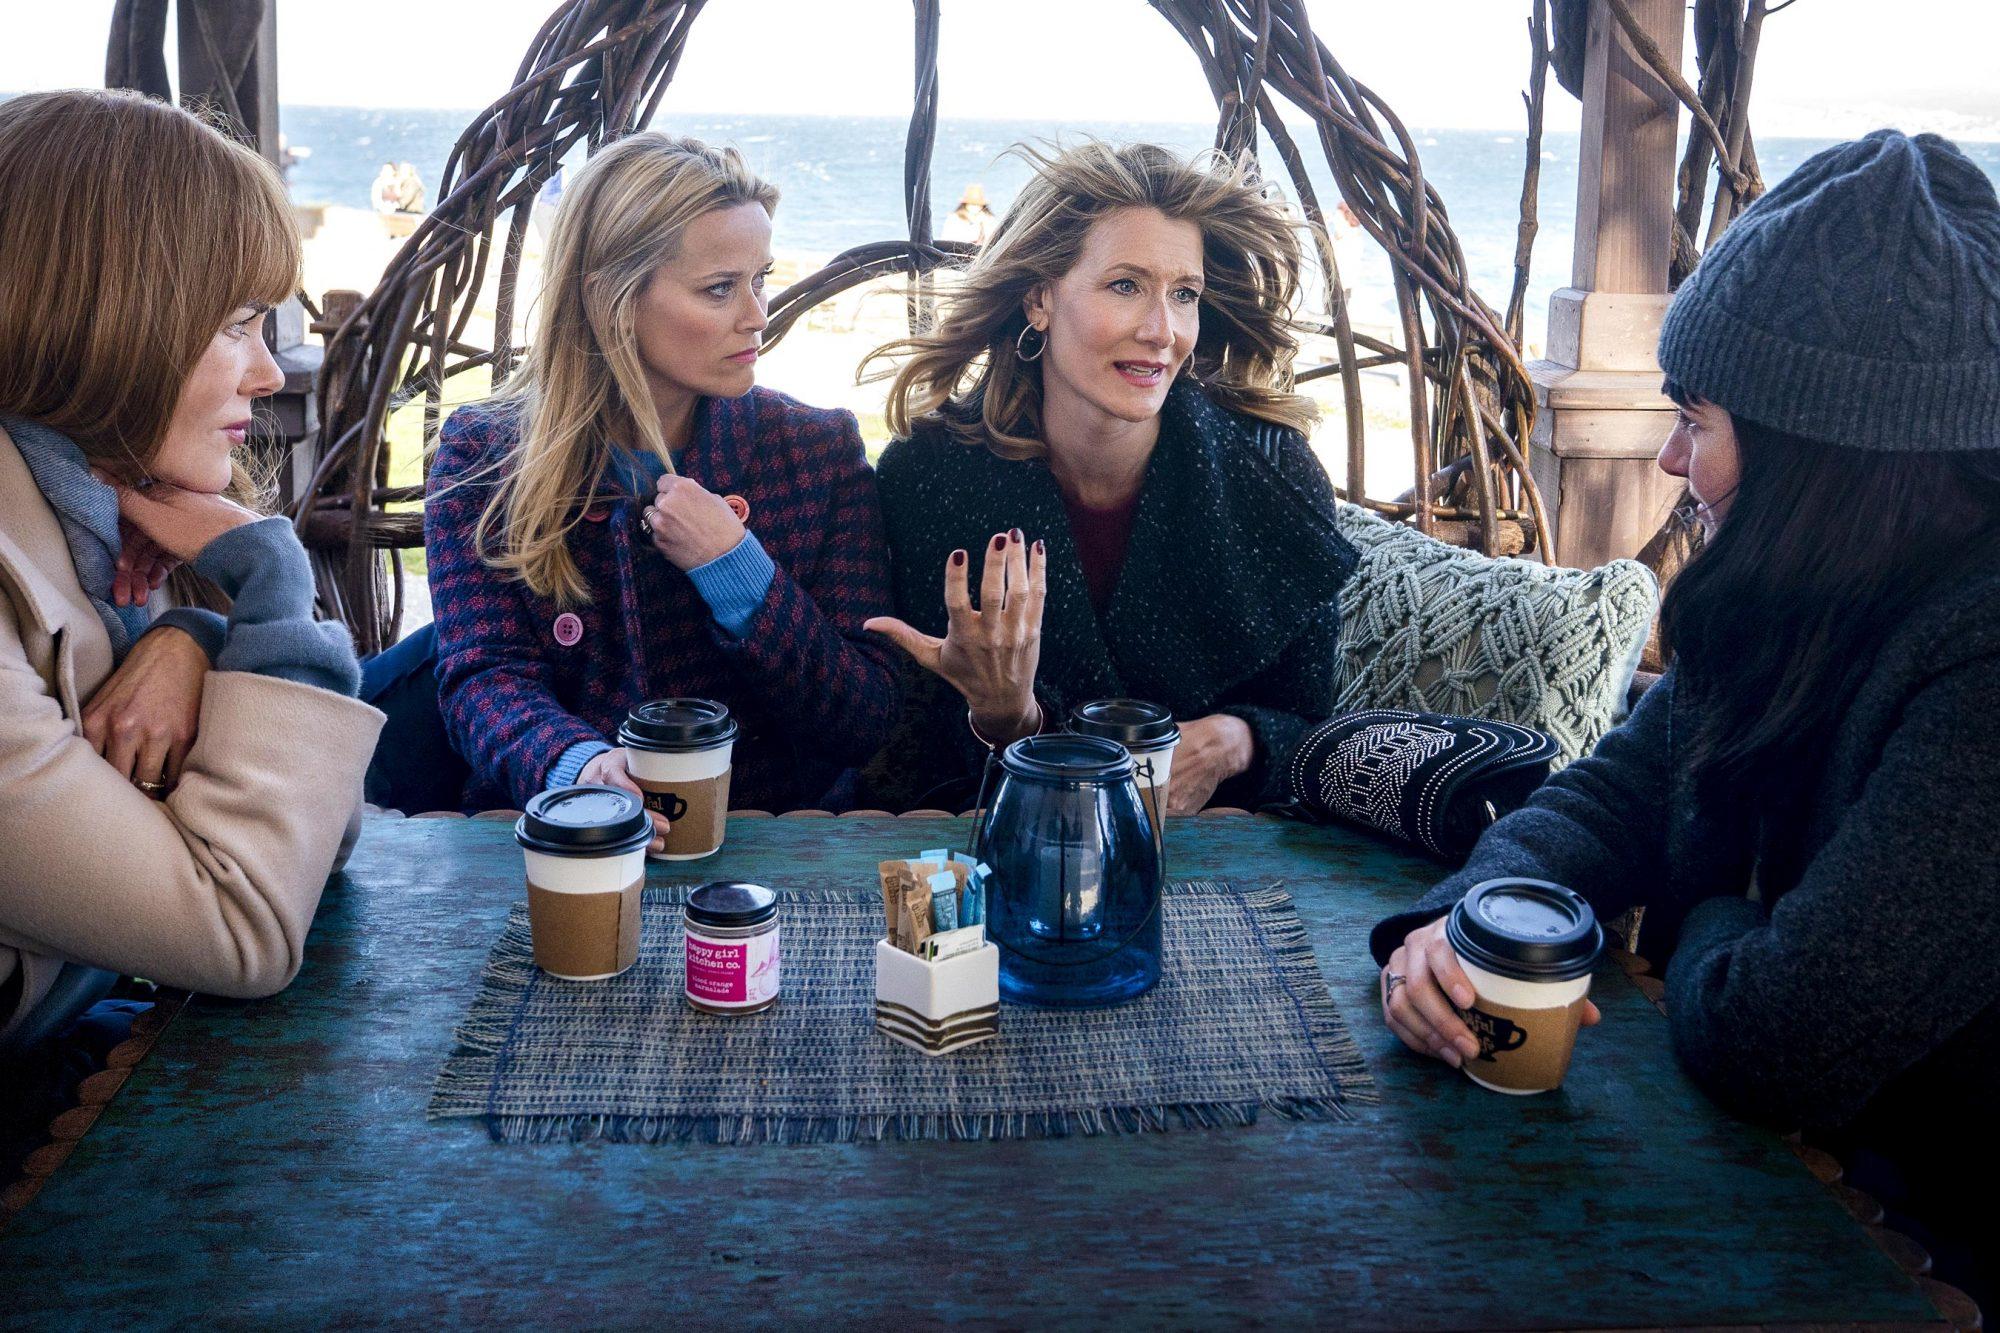 Big Little Lies Season 2 Nicole Kidman, Reese Witherspoon, Laura Dern, Shailene Woodley. photo: Jennifer Clasen/HBO